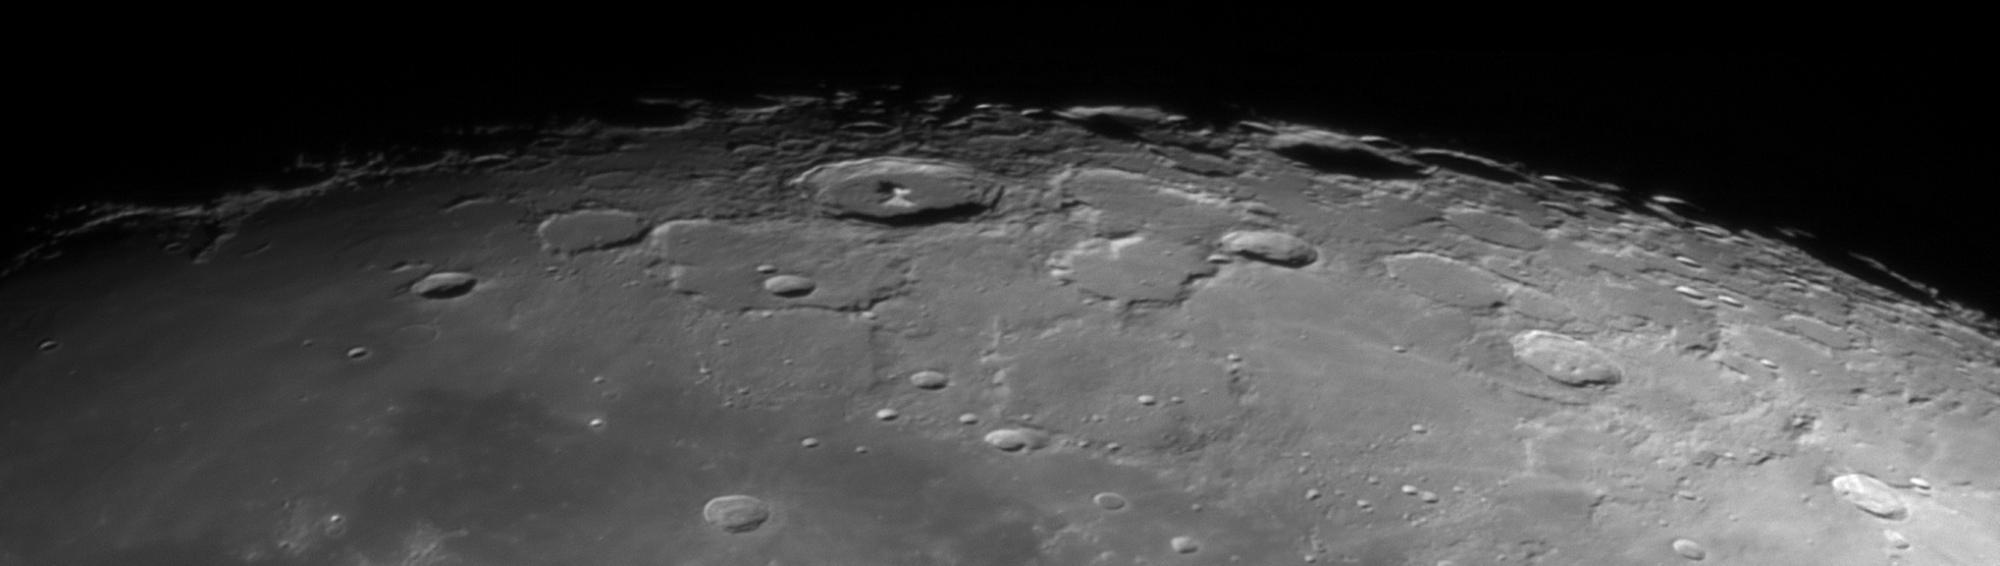 lune1.thumb.jpg.670ed9ee172cfacab74f4f2d5d60f954.jpg